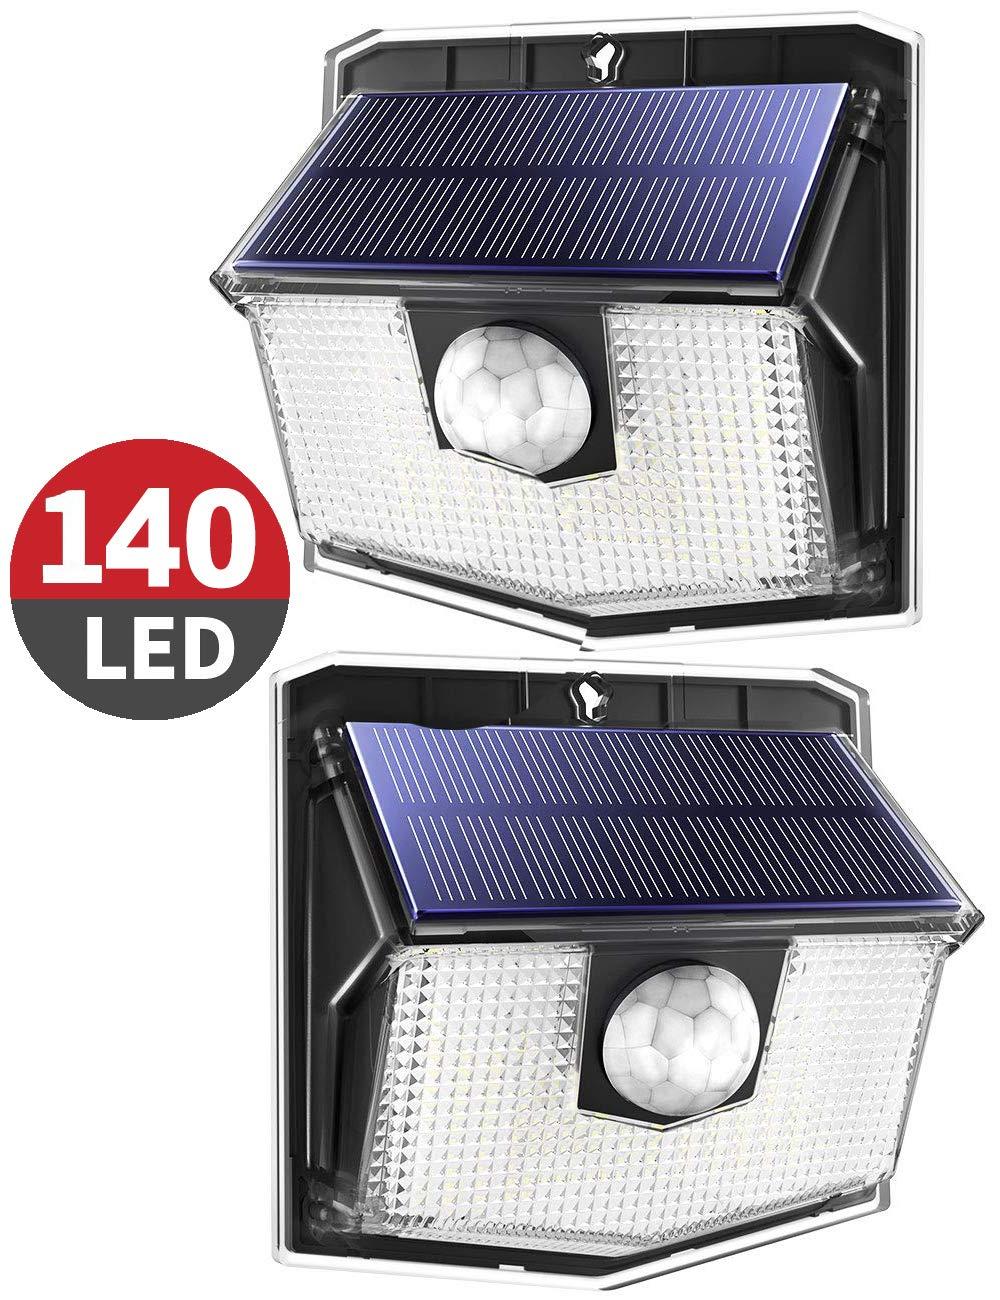 Mpow Luz Solar Exterior 140LED,IP 67 Impermeable Lámpara Solar de 3-8M Detección, 270º Gran Angular de Iluminación con 120° Sensor de Movimiento product image